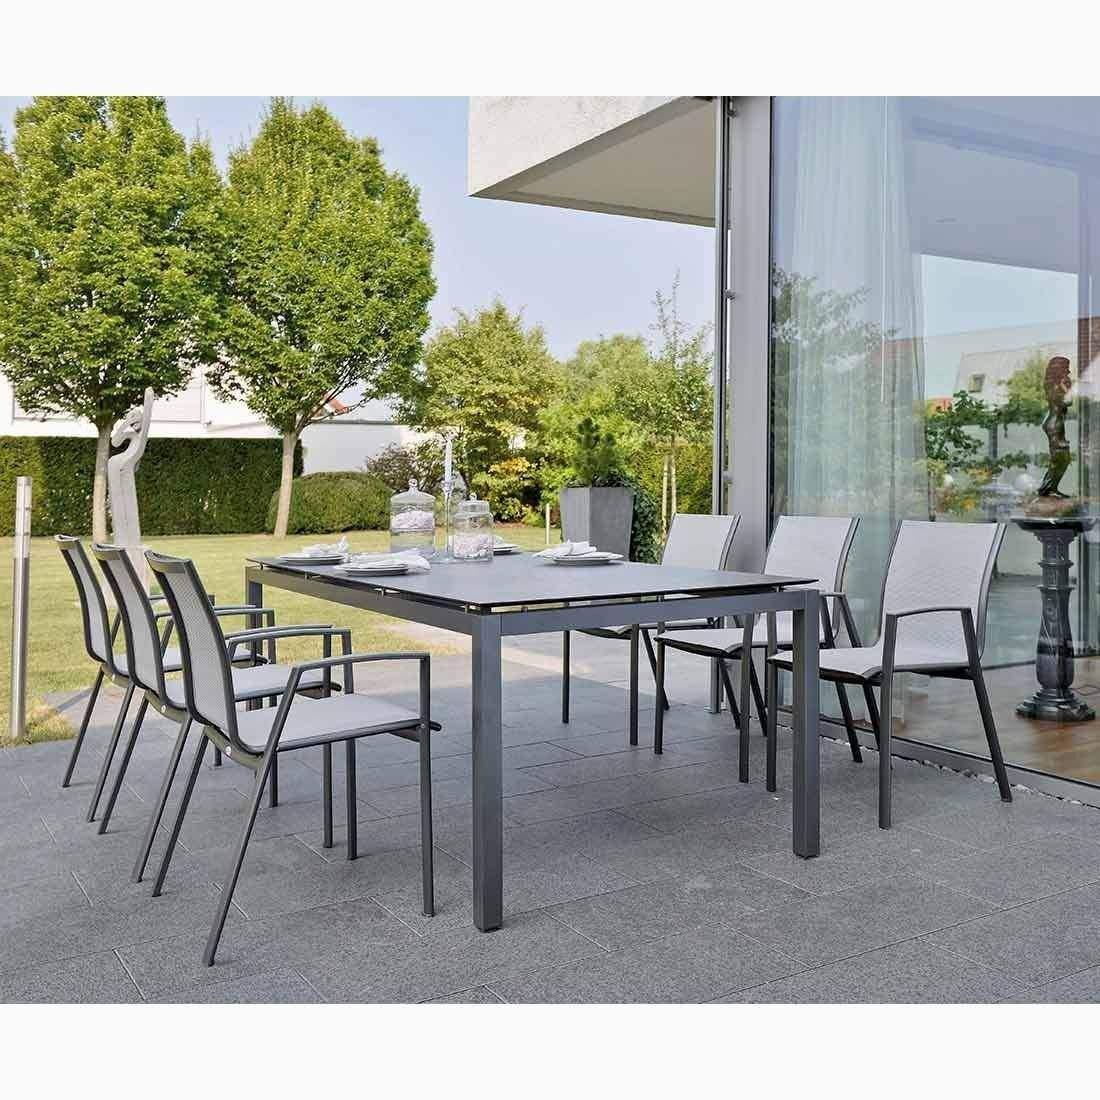 Rattanmöbel Garten Neu 11 Möbel De Stühle Luxus